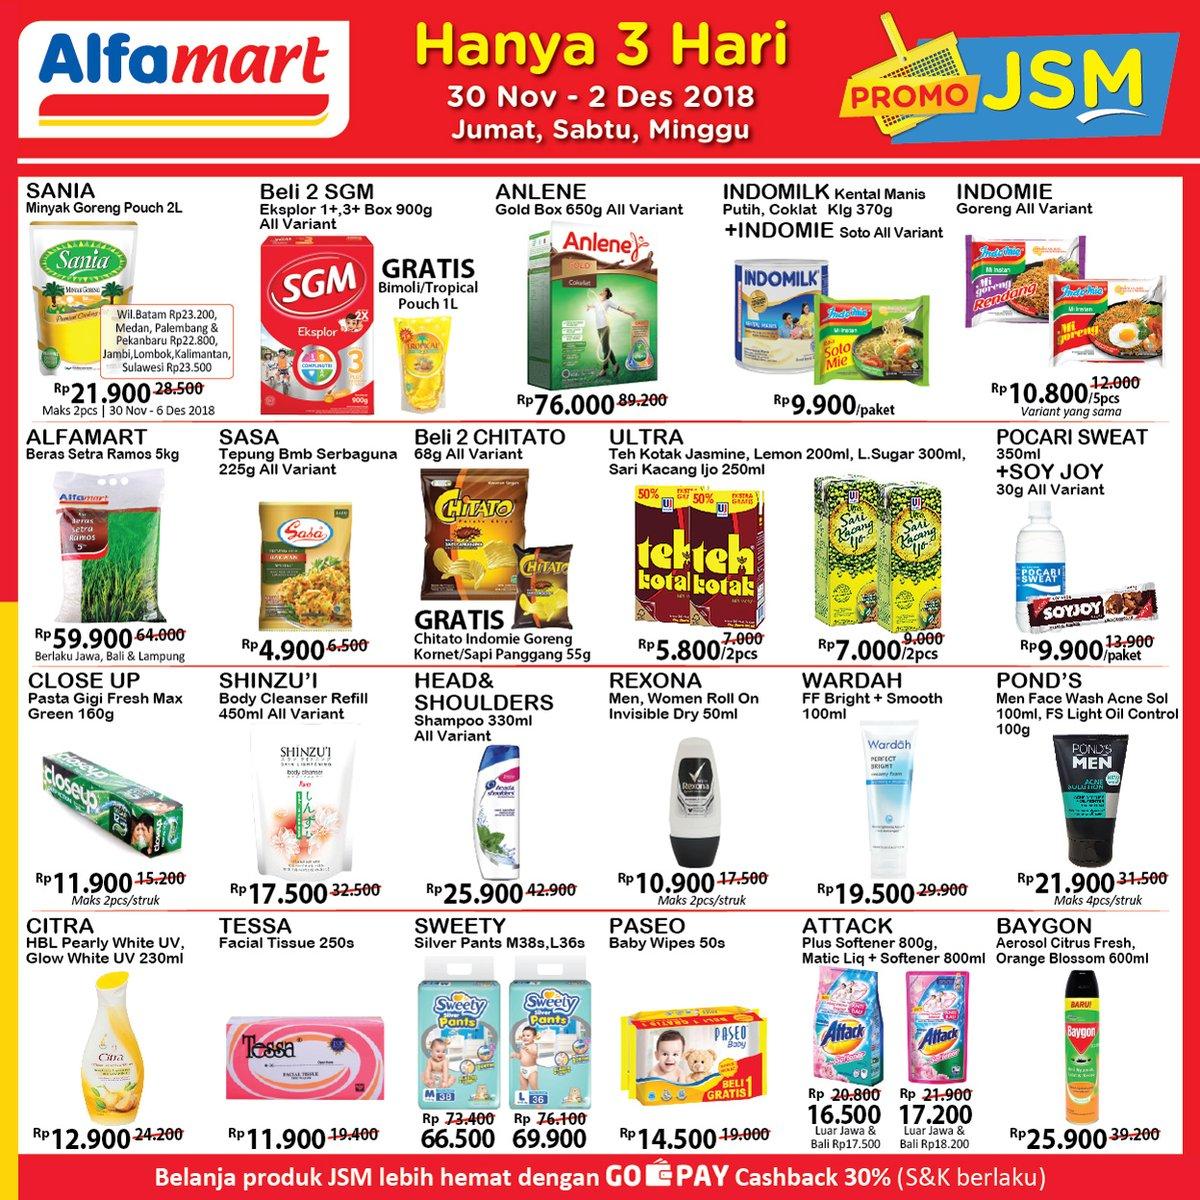 Alfamart - Promo JSM Periode 30 - 02 Desember 2018